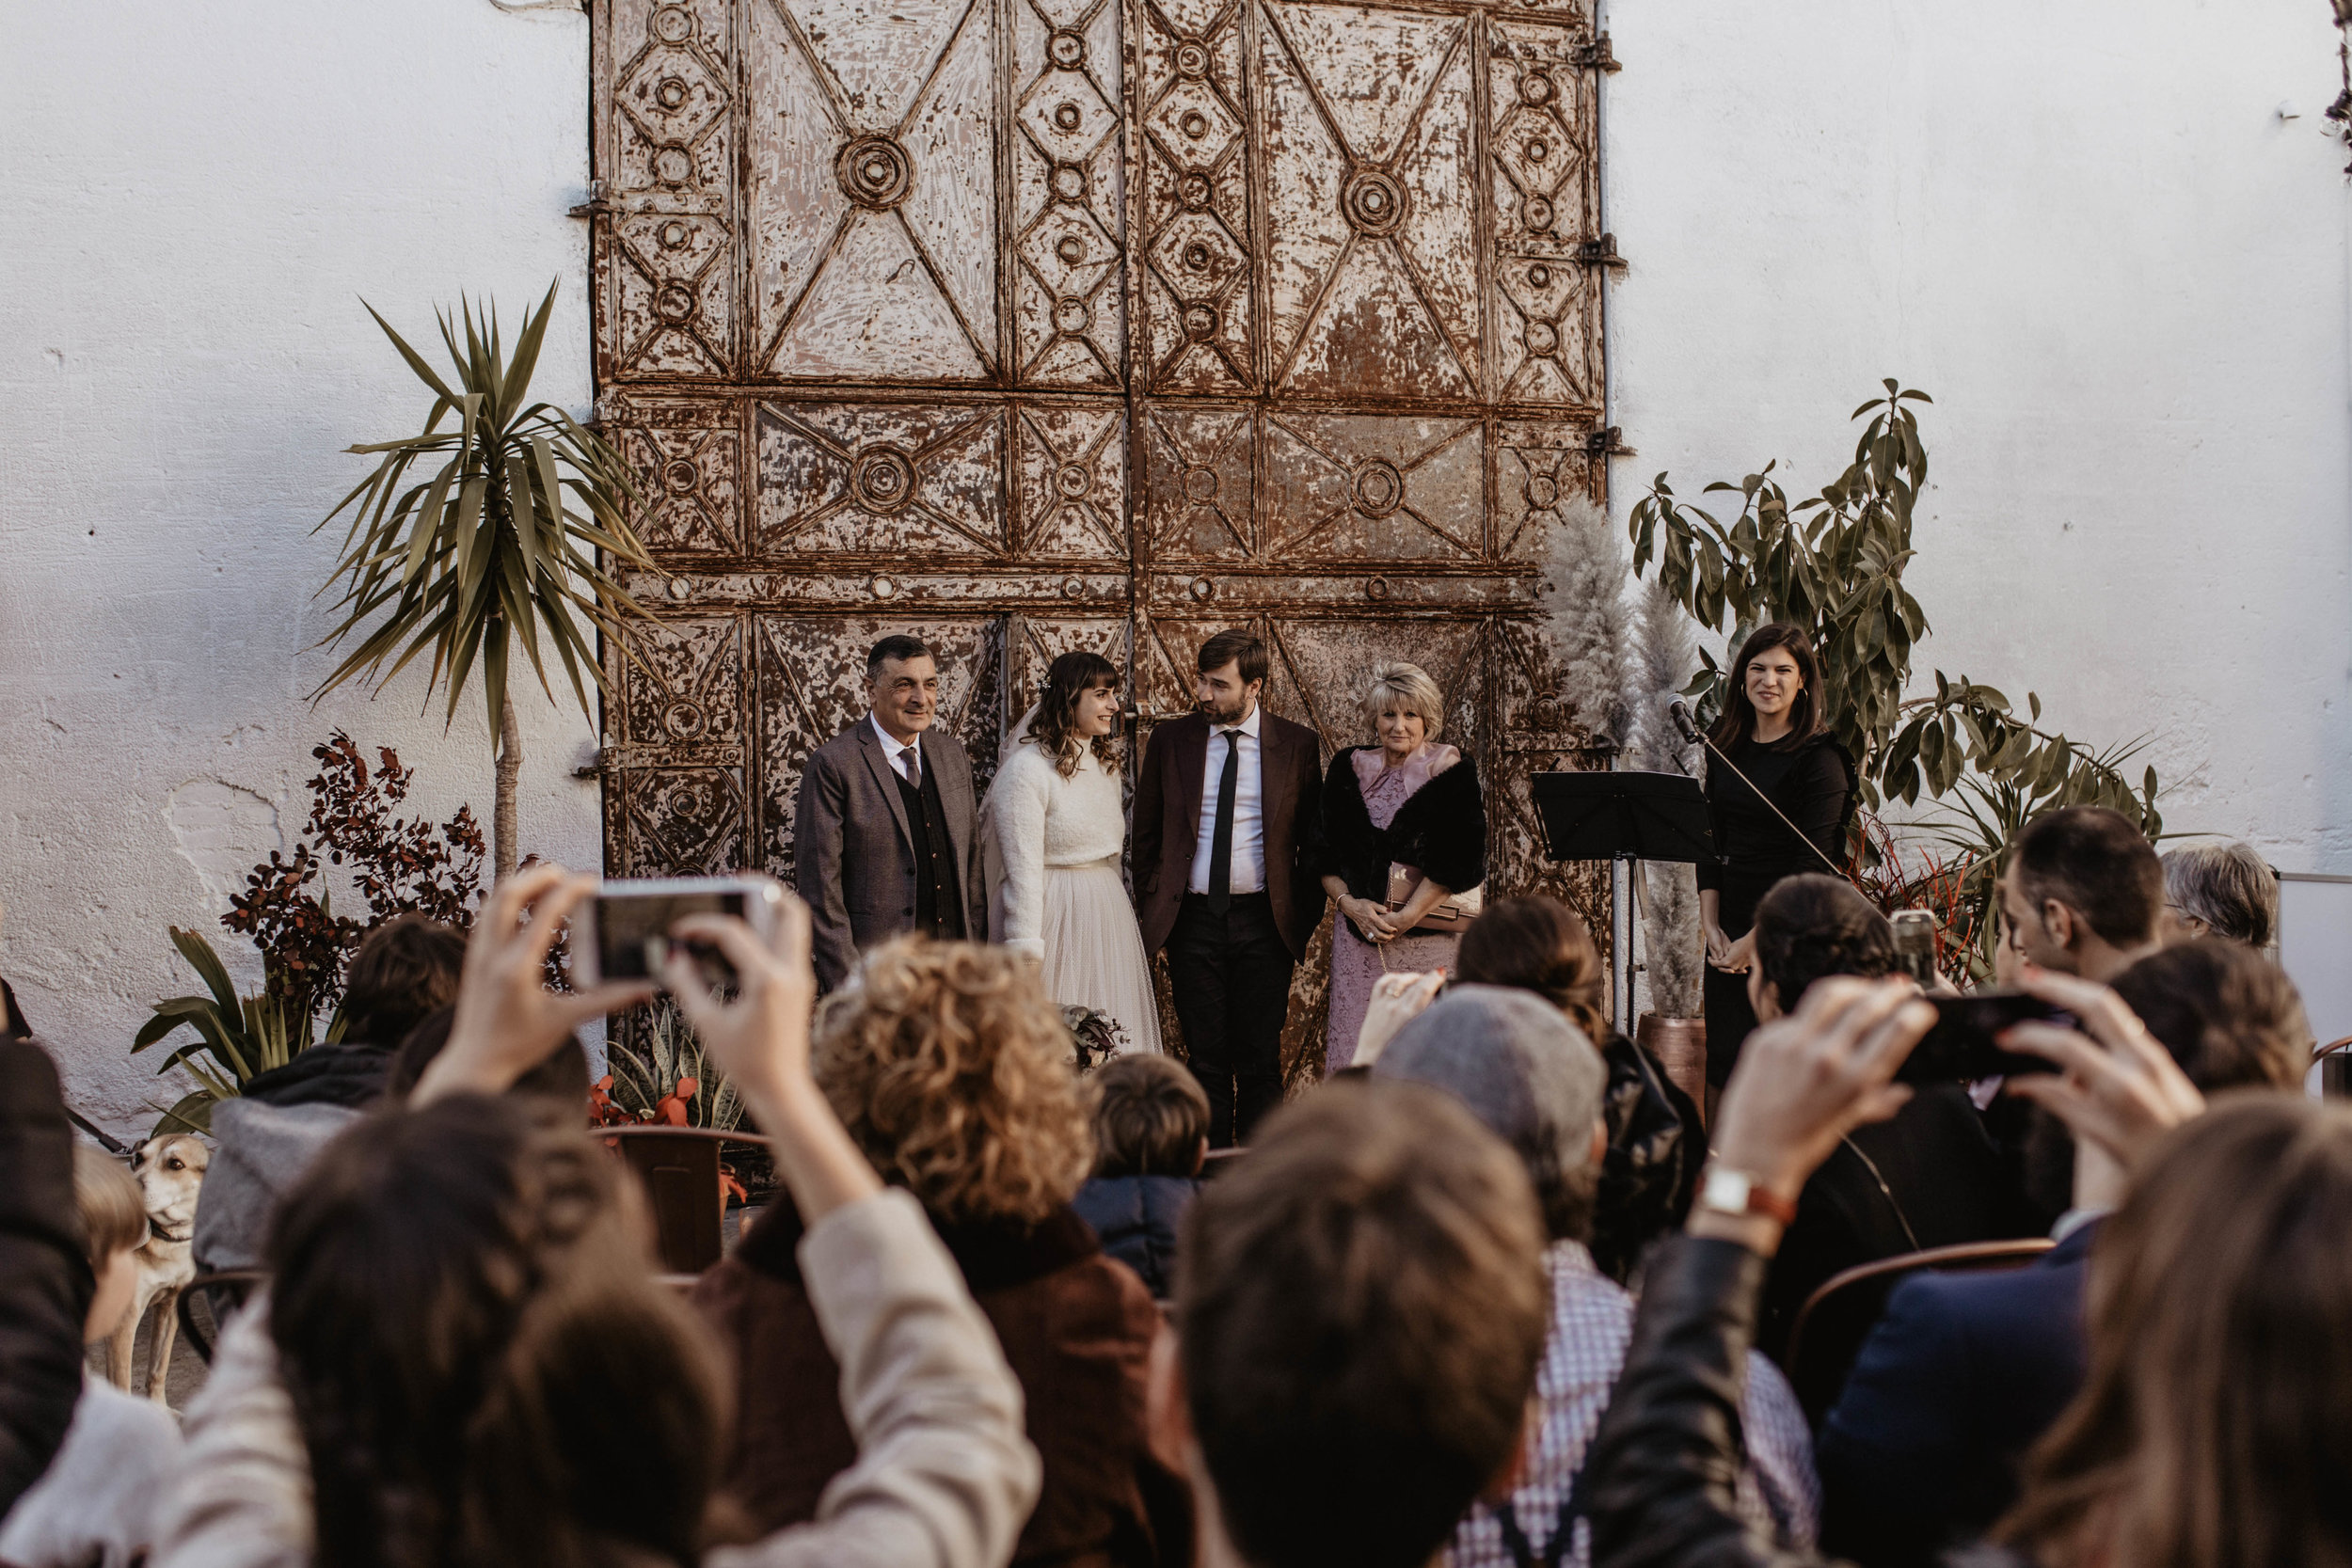 thenortherngirlphotography-photography-weddingphotography-couple-bodasconestilo-bodasenbarcelona-martadavid-558.jpg